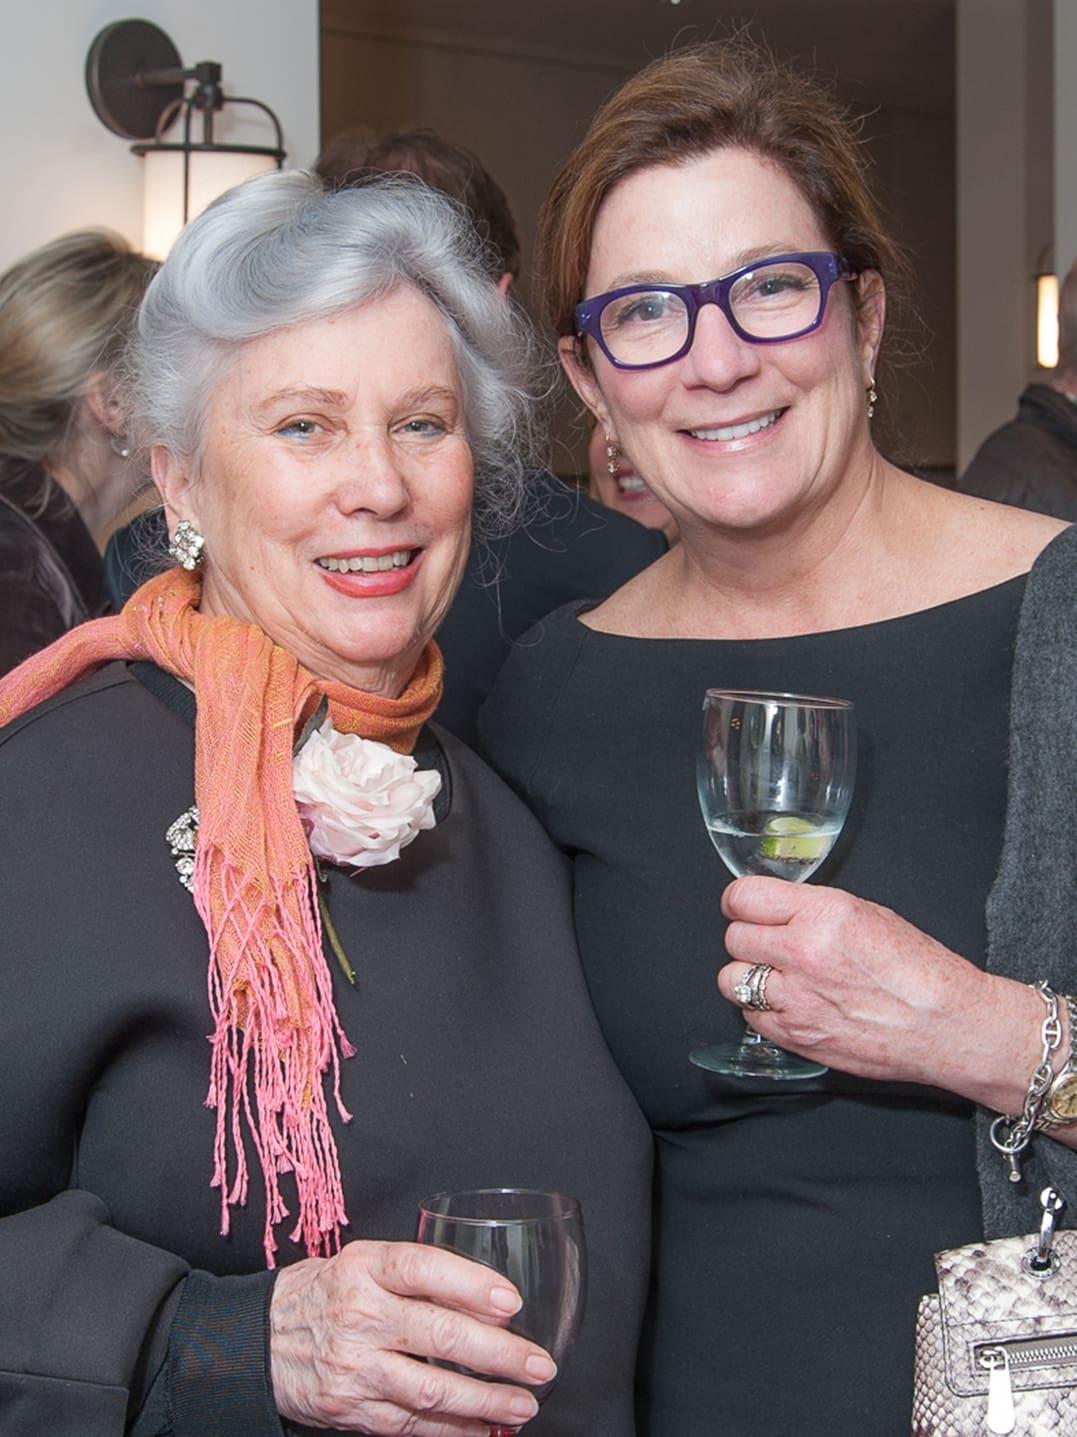 Houston, Da Camera VIP launch event for Sarah's Marcel Proust Project, Salle Vaughn & Carolyn Landen